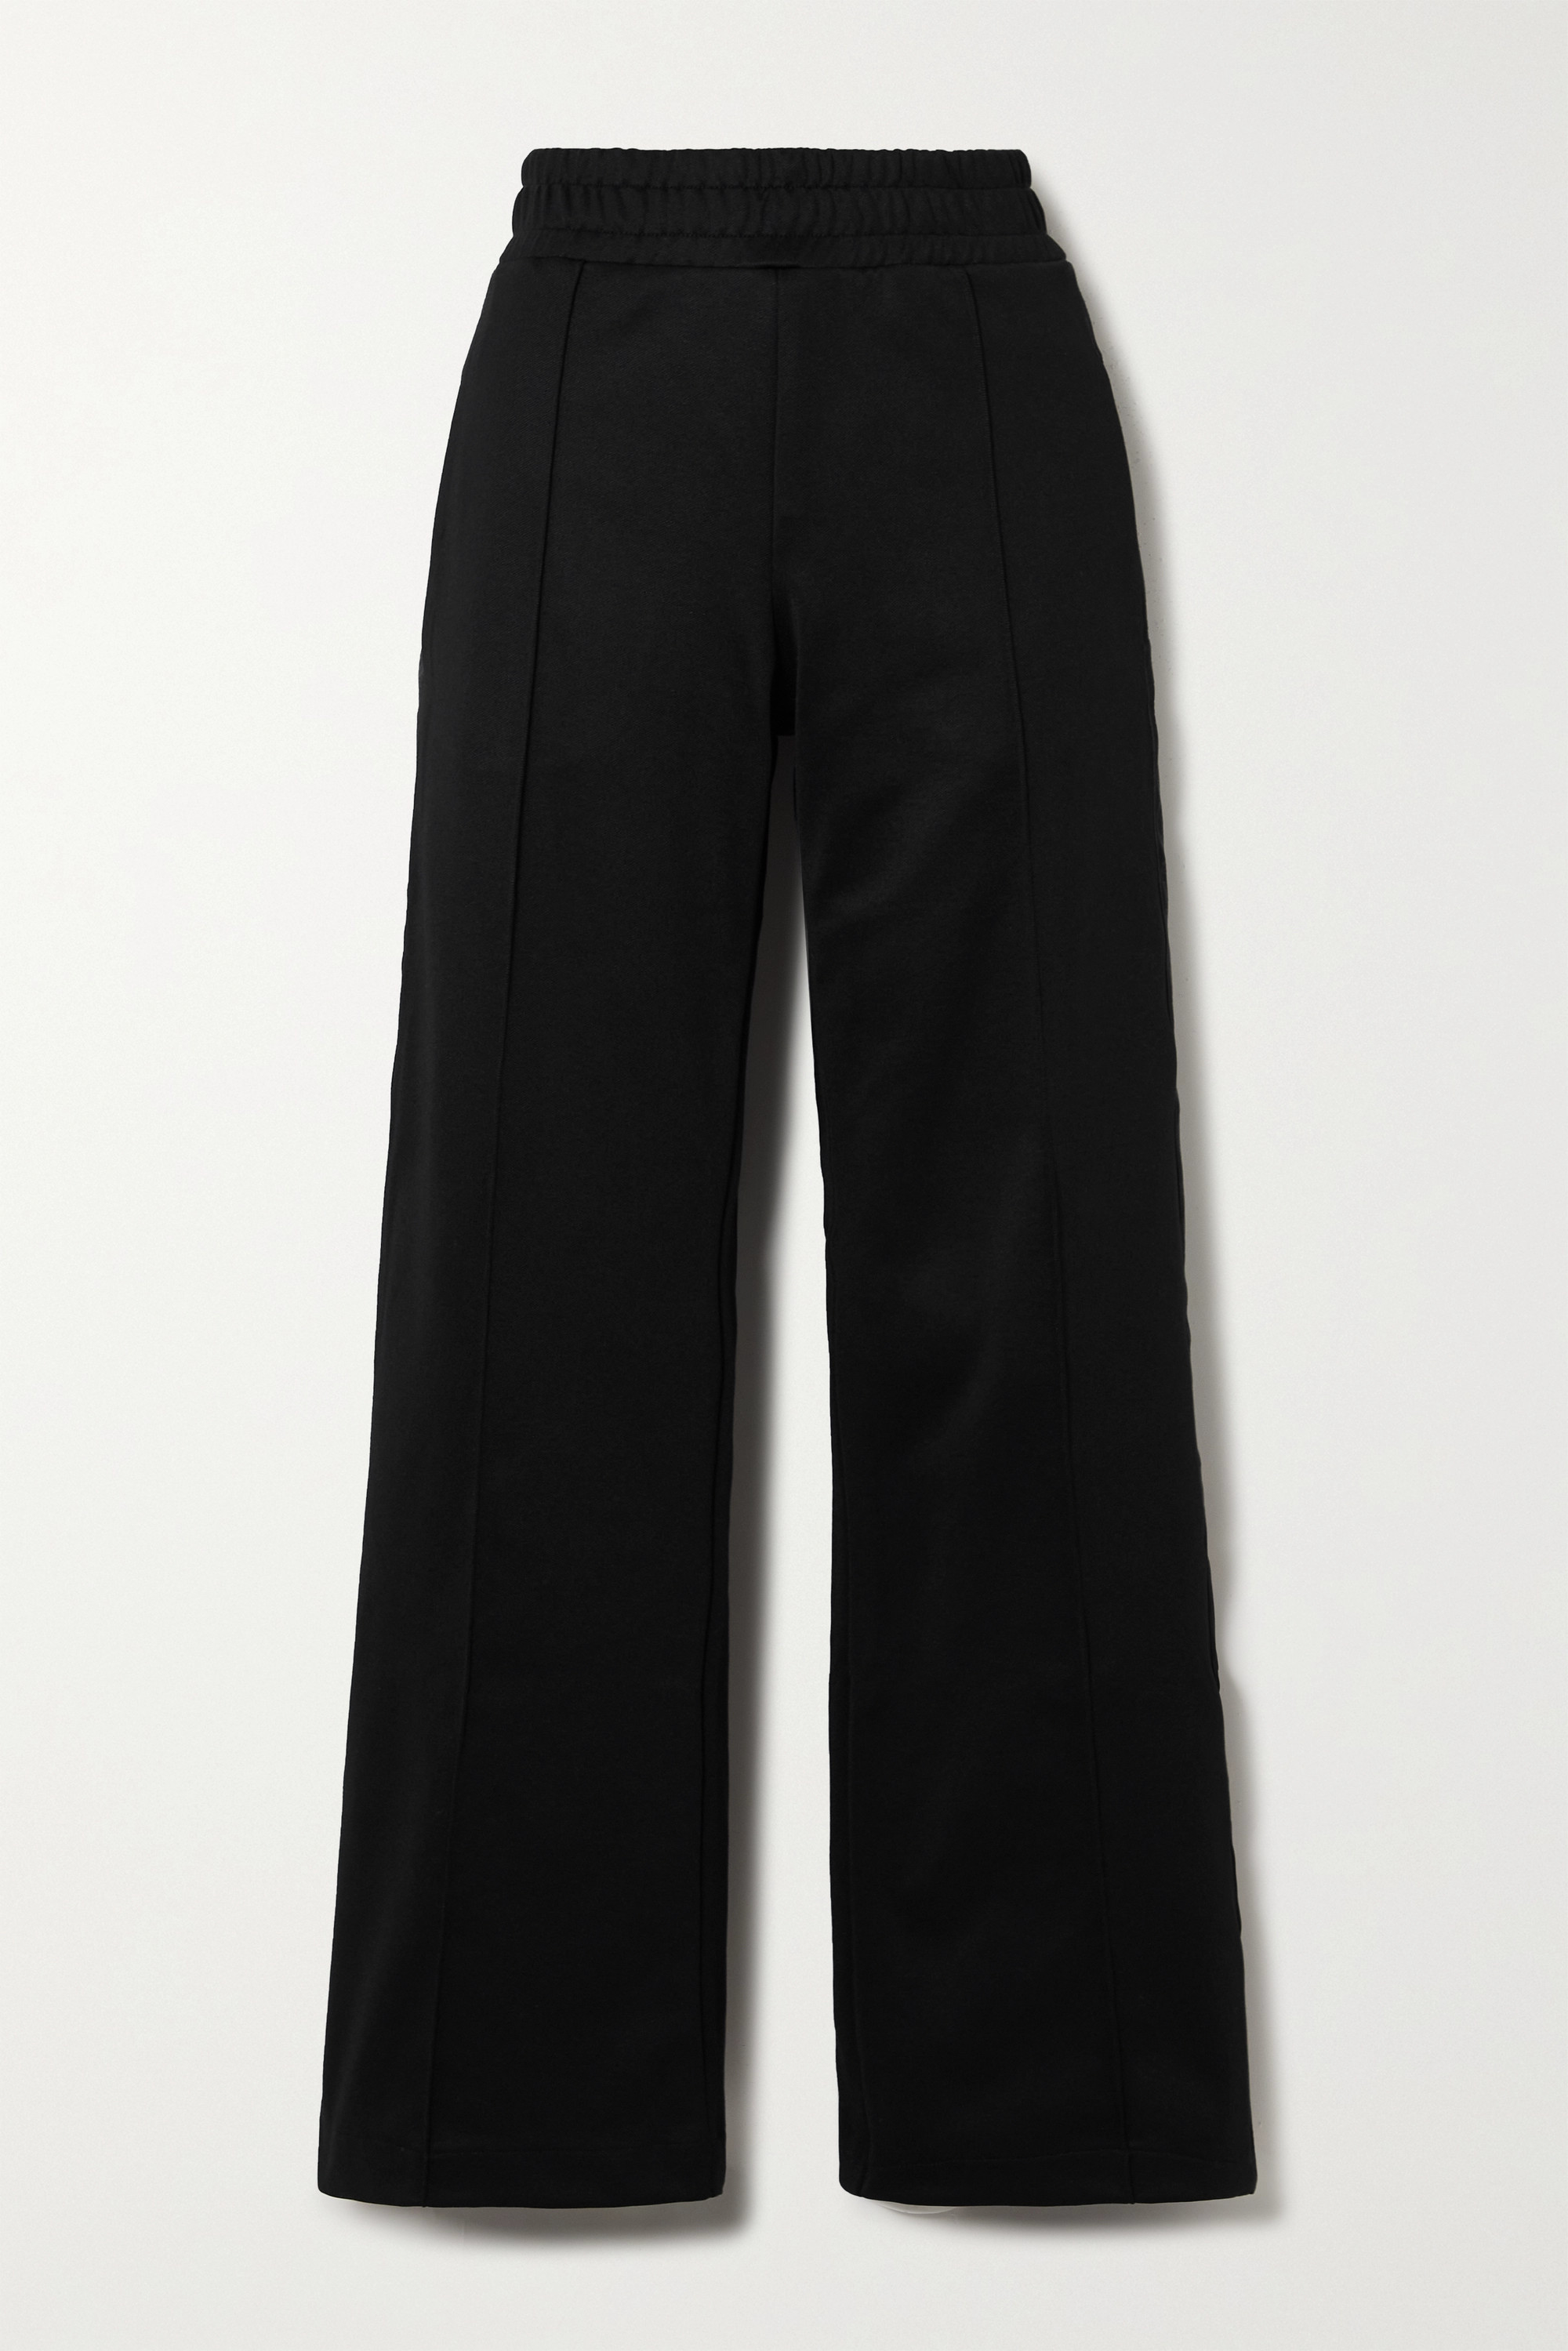 Fendi Jersey-piqué wide-leg track pants